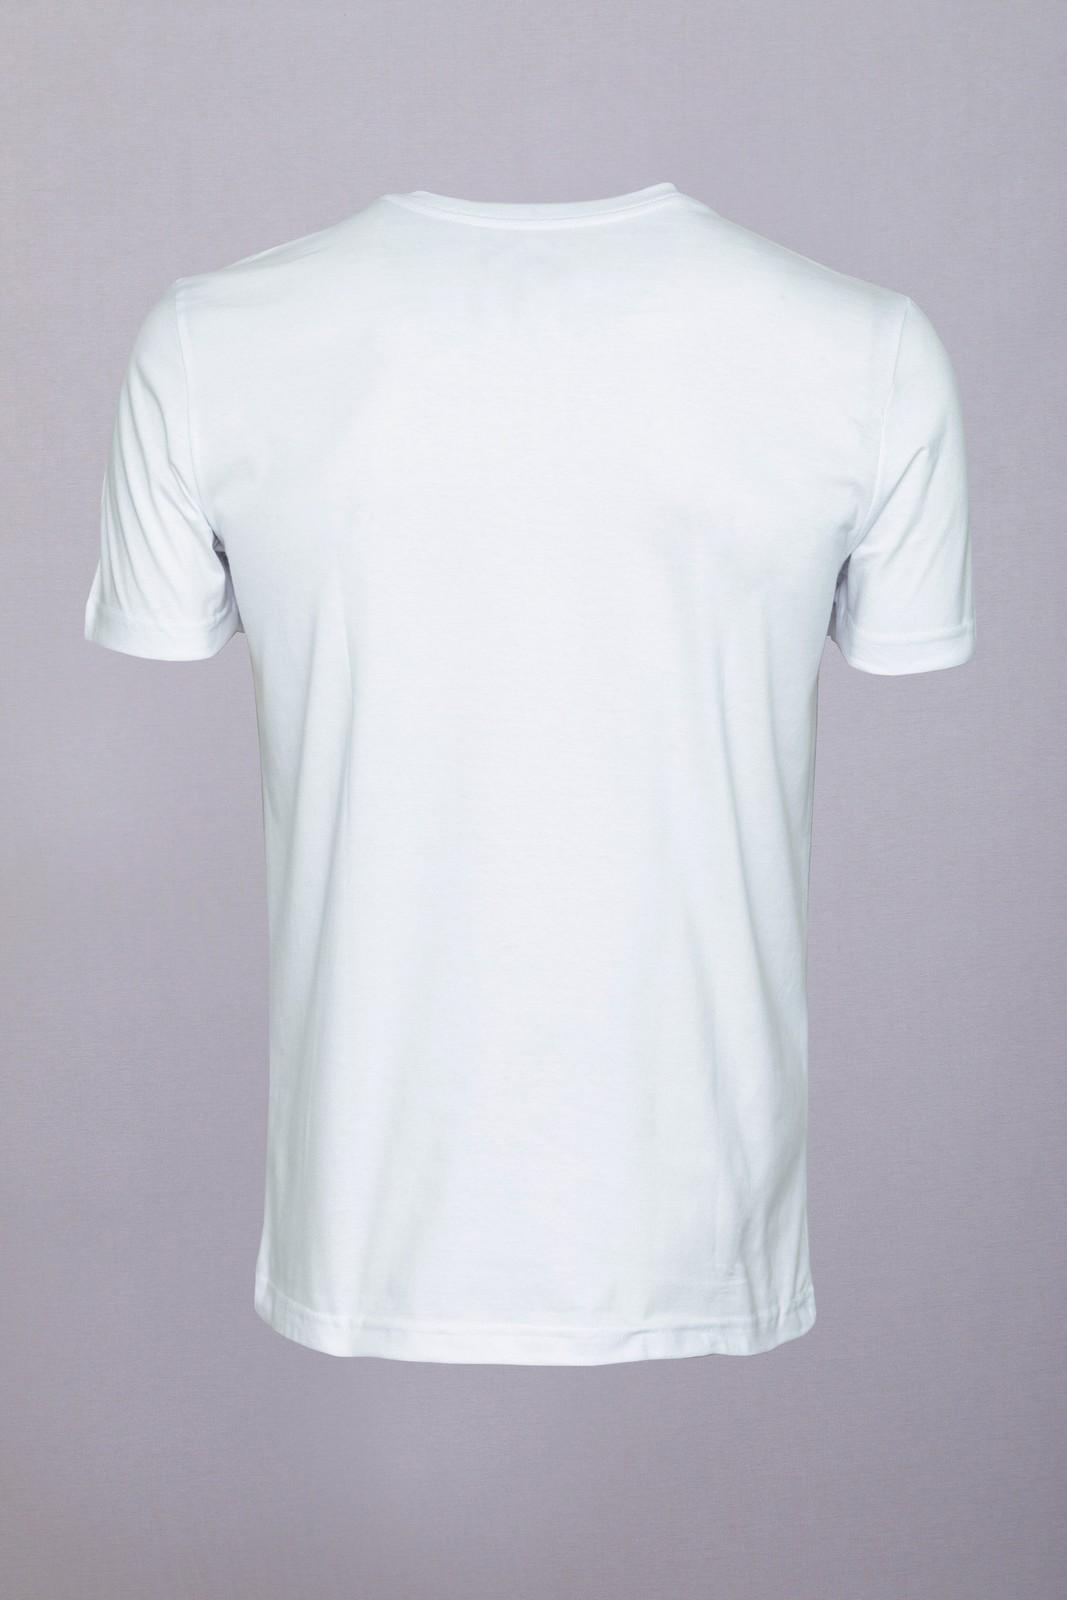 Camiseta CoolWave Beach.CA Branca